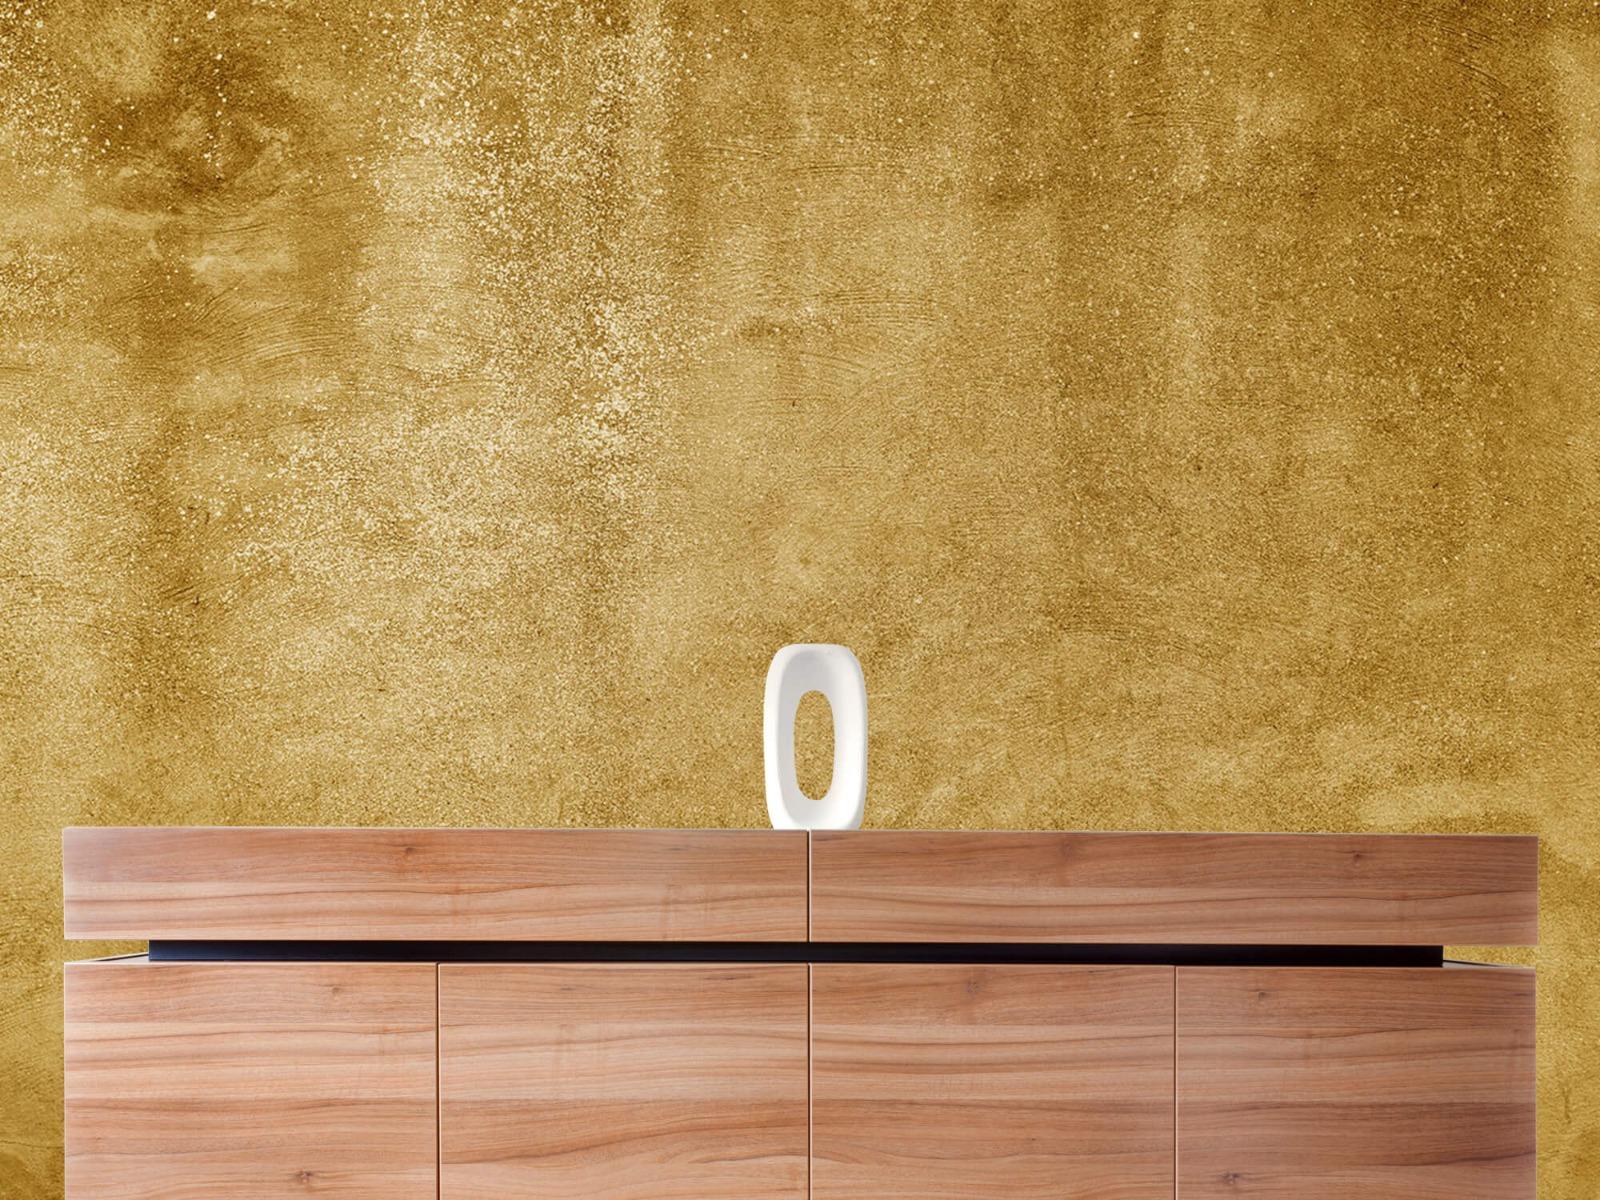 Betonlook behang - Oker geel beton - Woonkamer 20